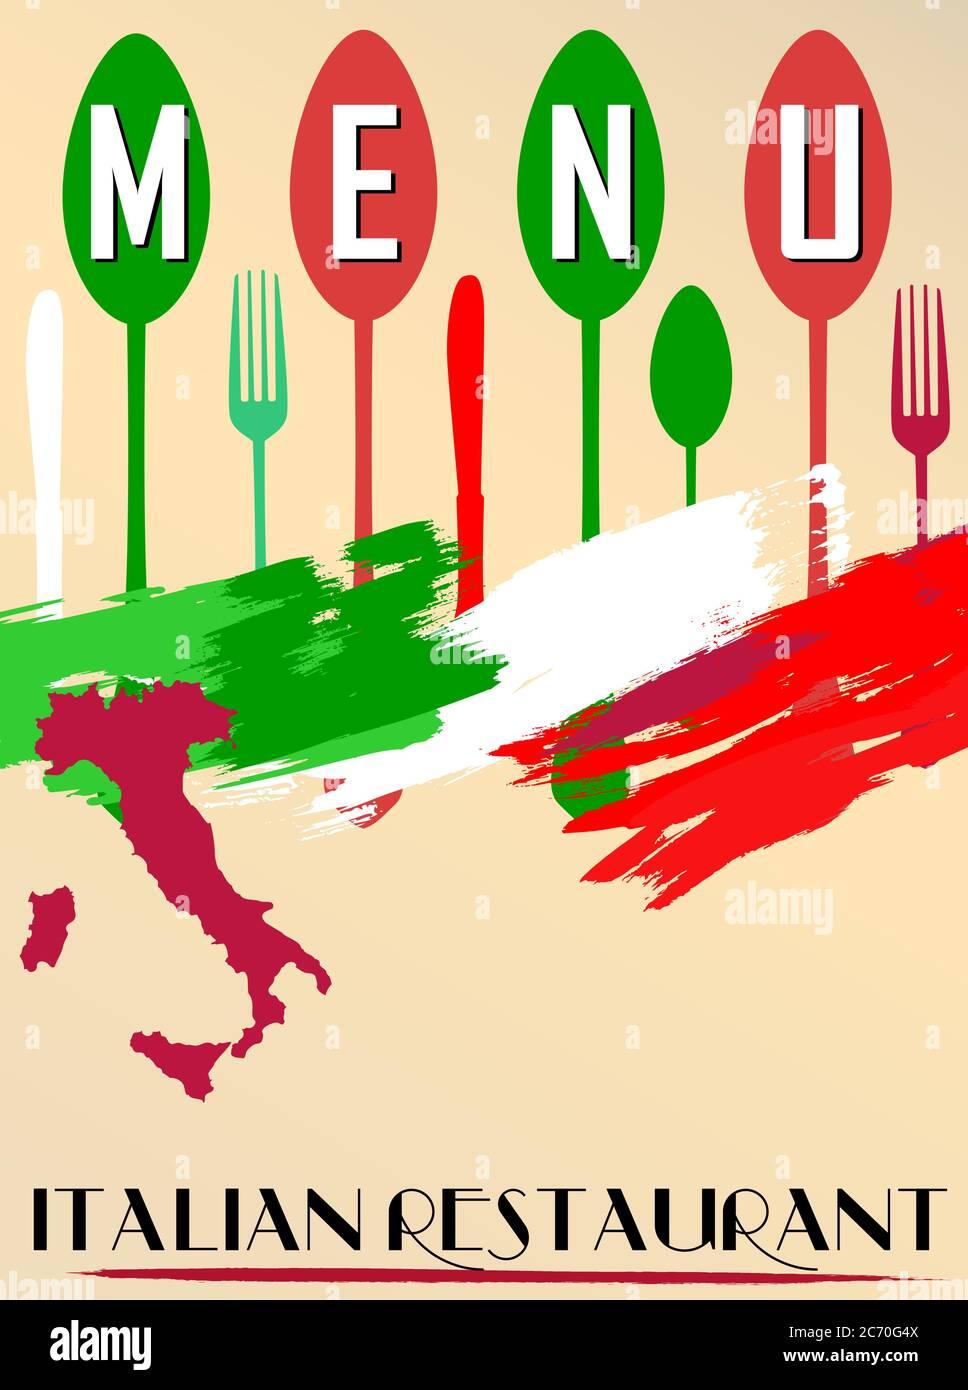 Menu For Italian Restaurant Free Copy Space Stock Vector Image Art Alamy